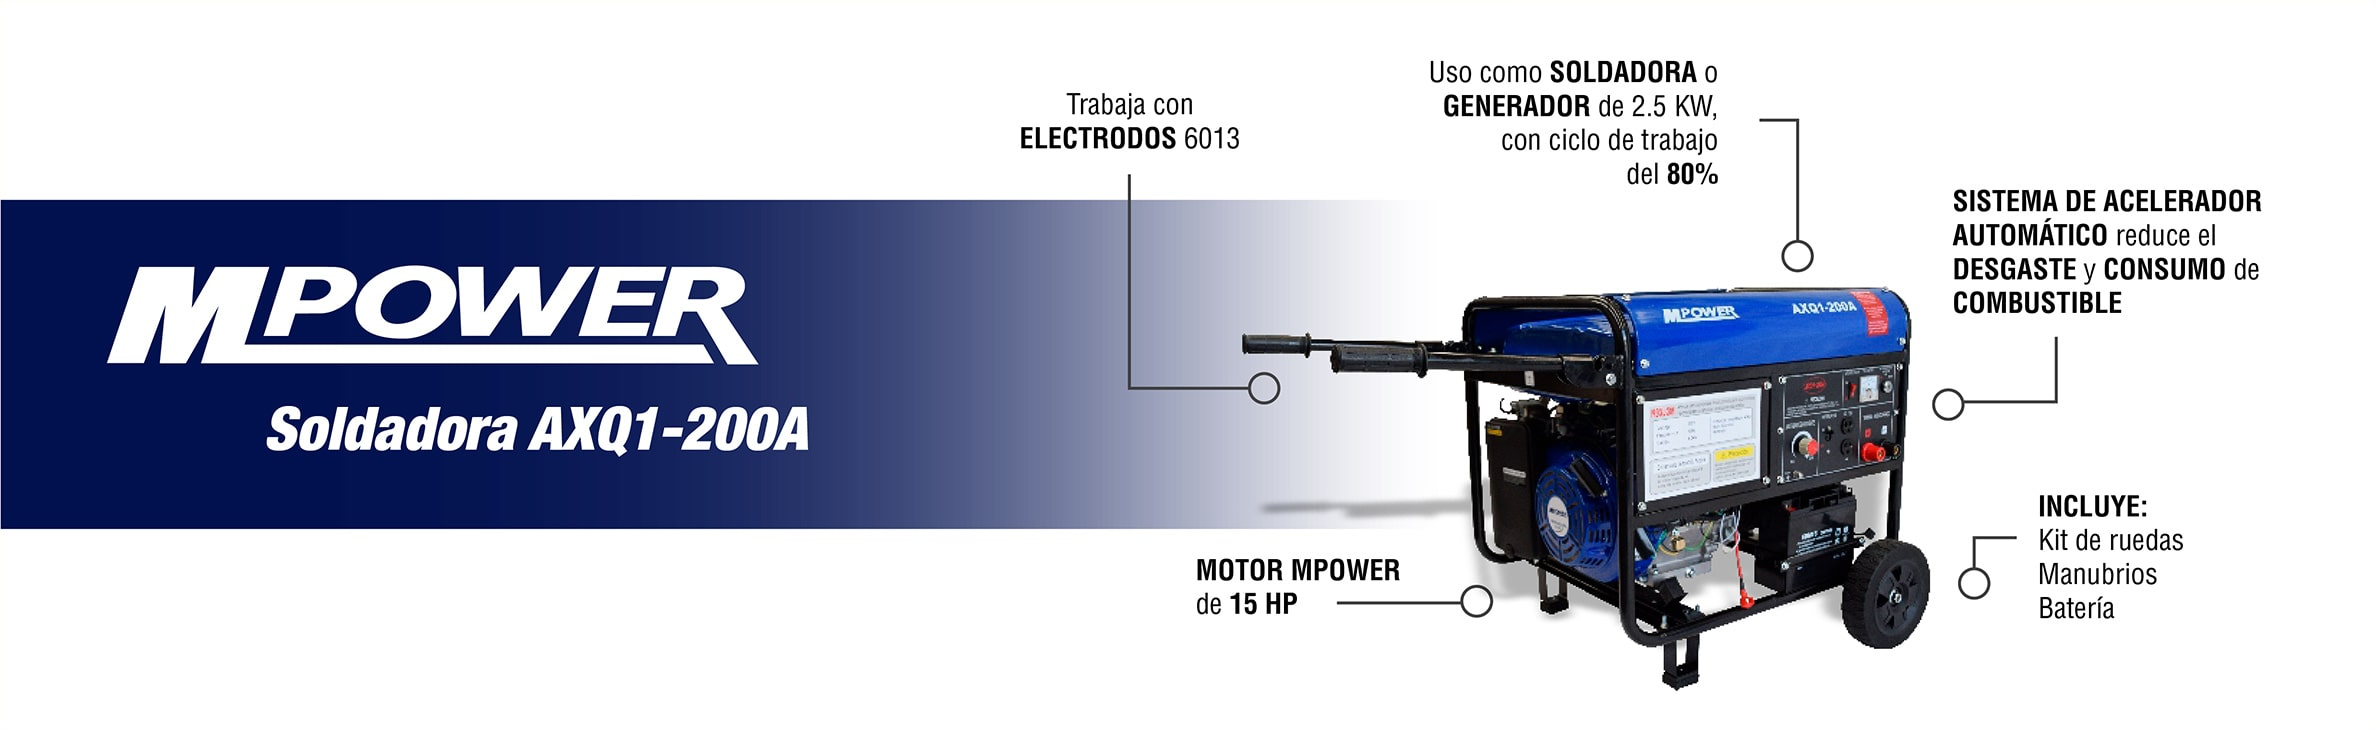 soldador-mpower-nicaragua